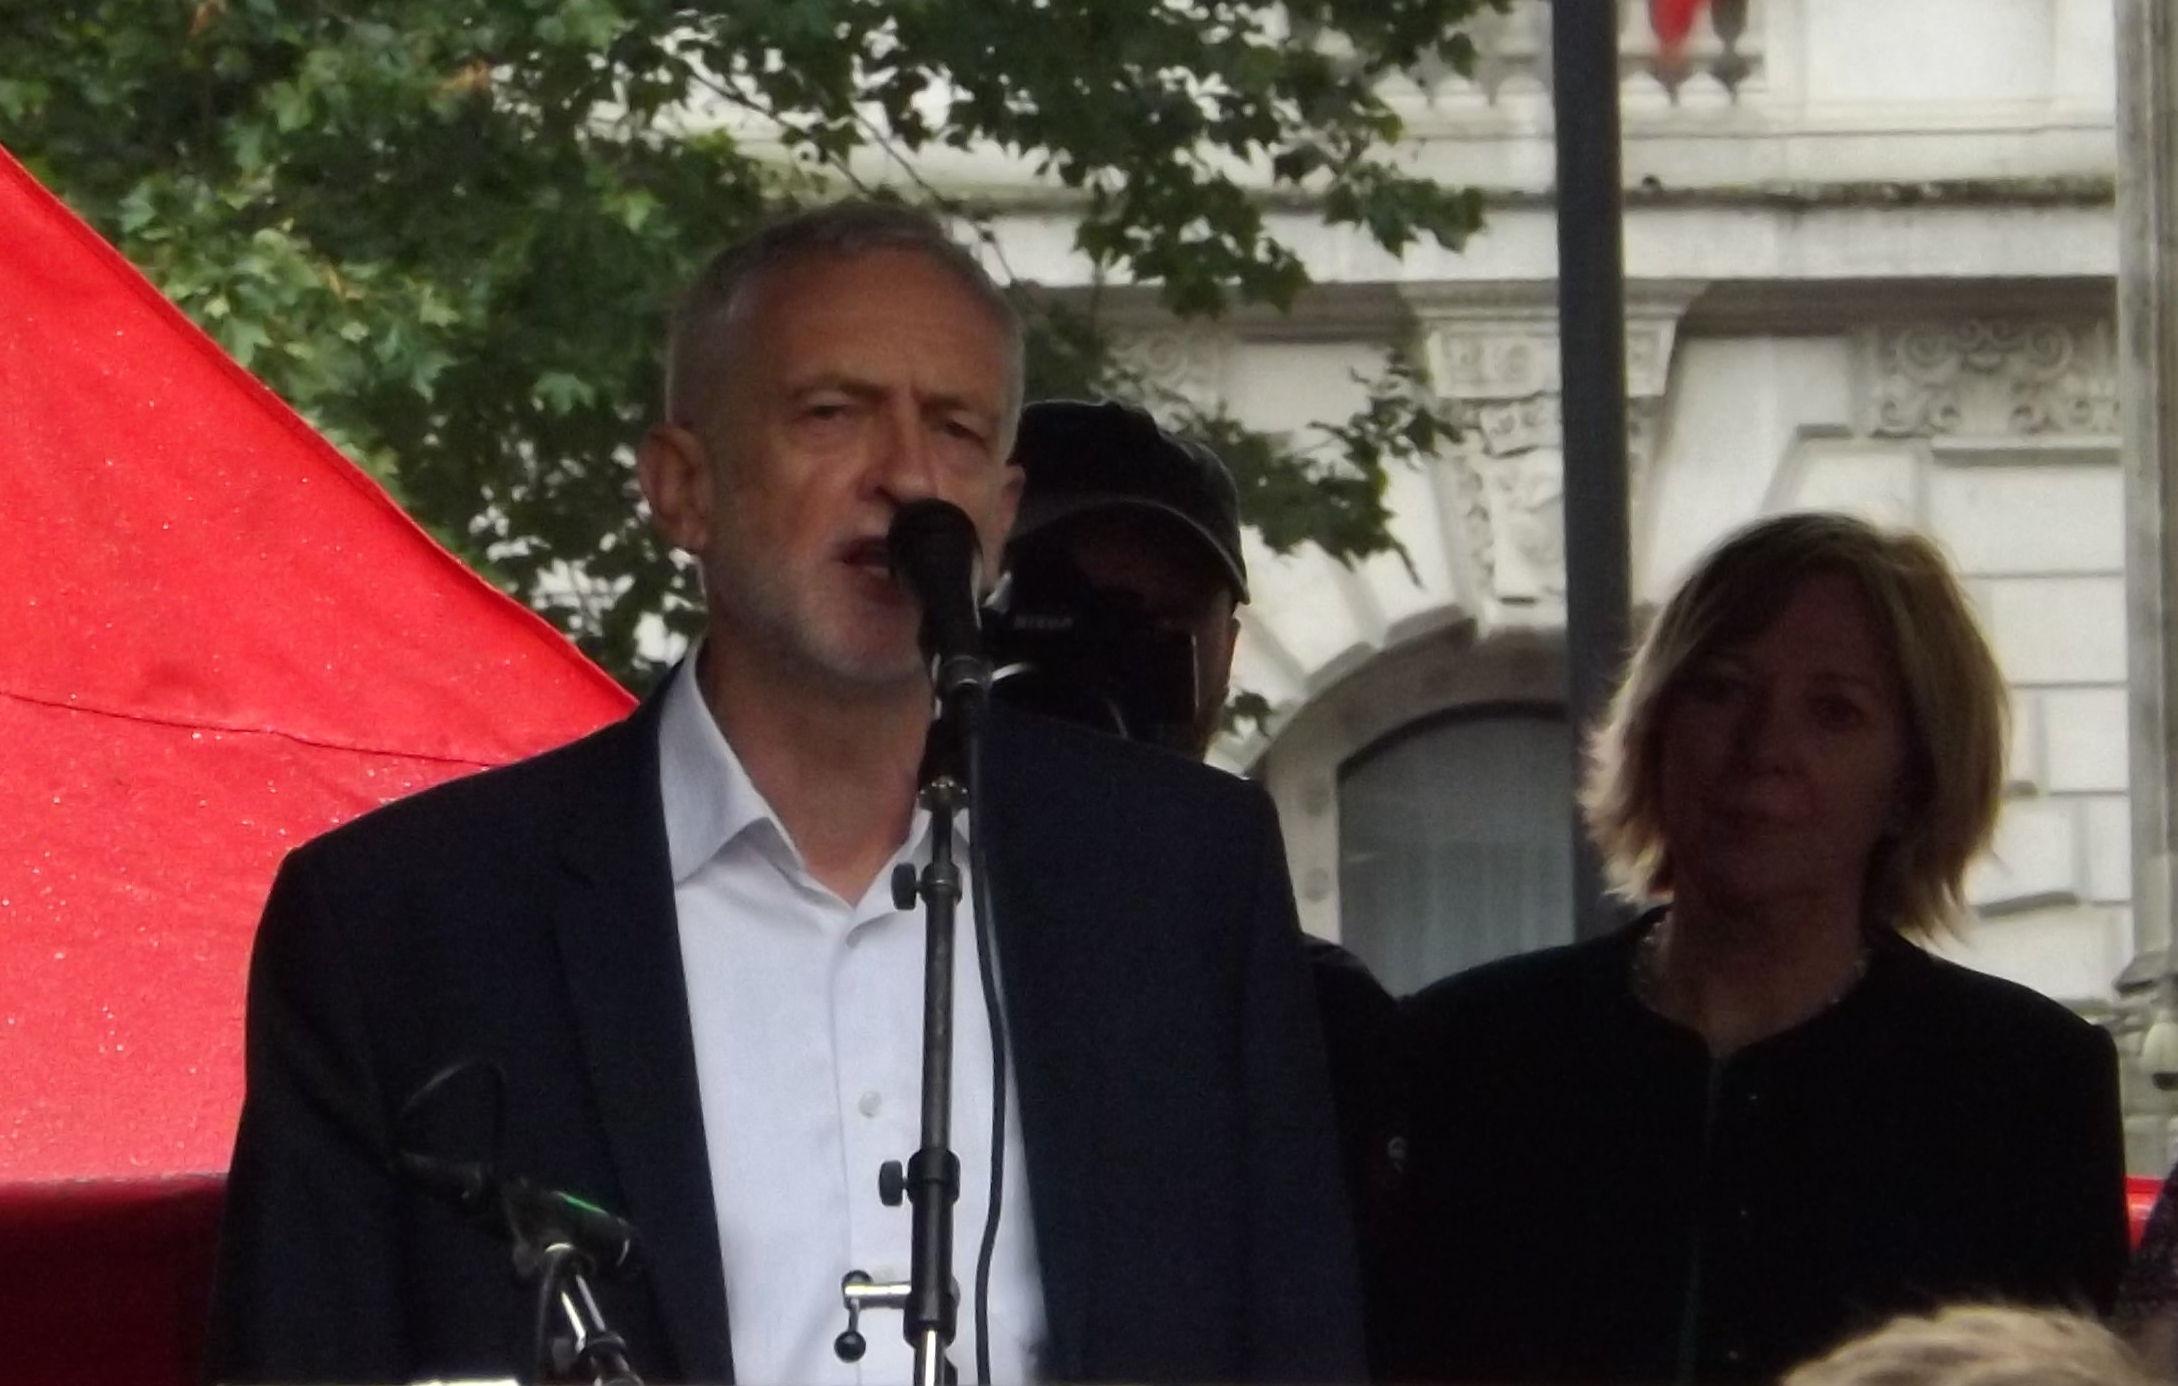 Jeremy Corbyn at anti-Trump rally